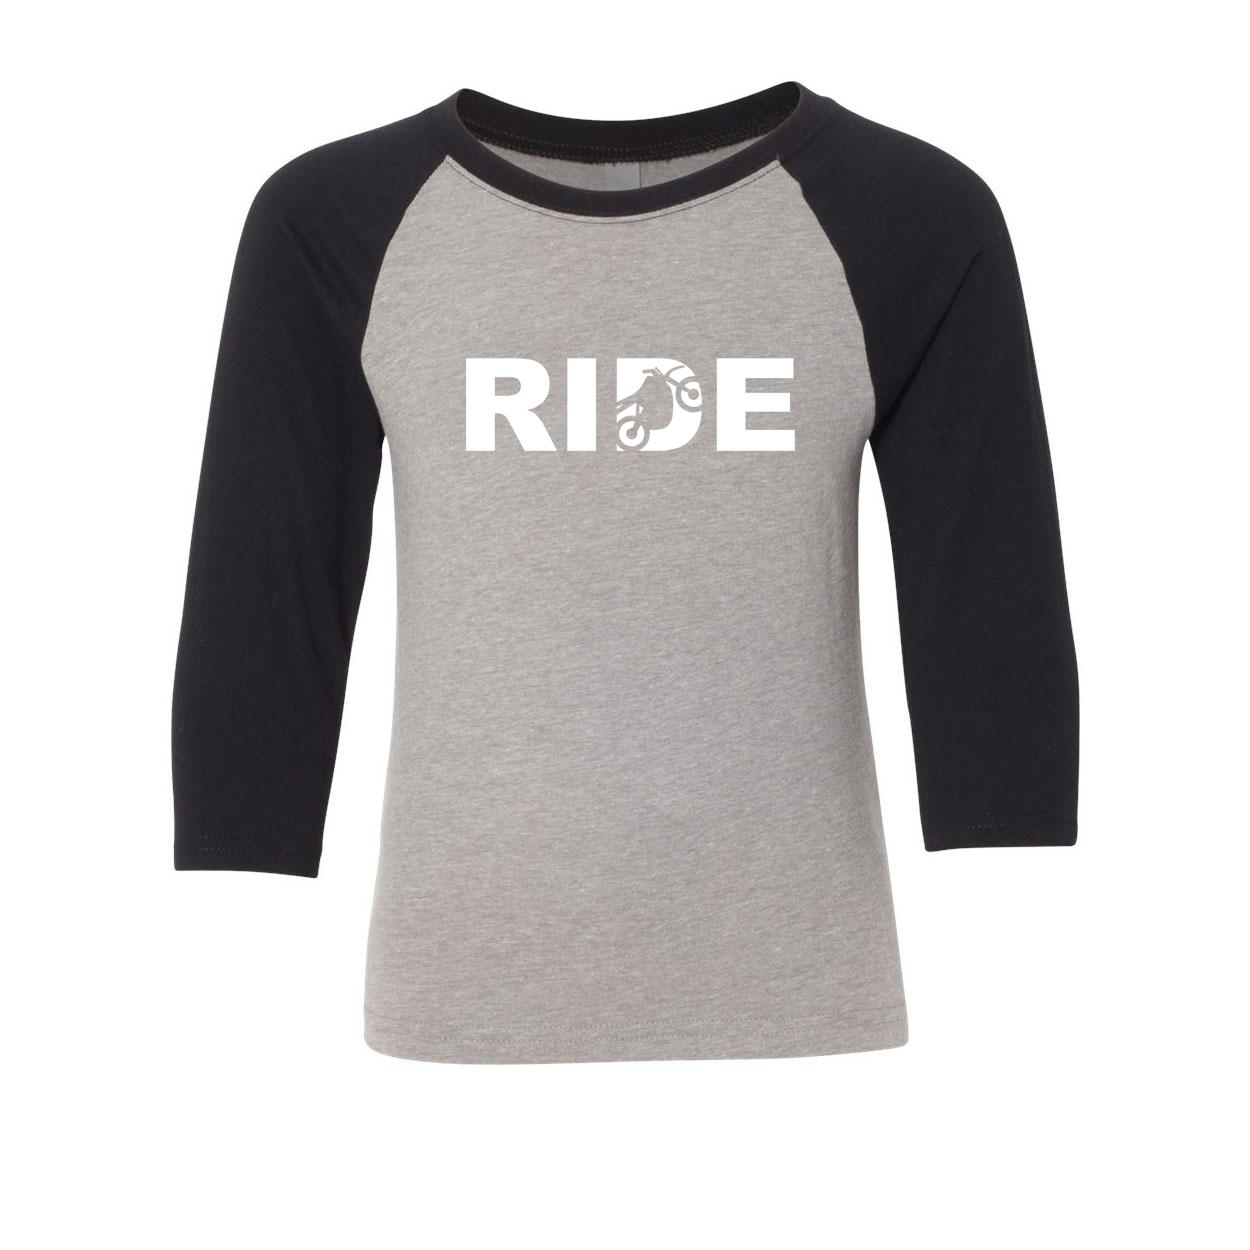 Ride Moto Logo Classic Youth Premium Raglan Shirt Gray/Black (White Logo)